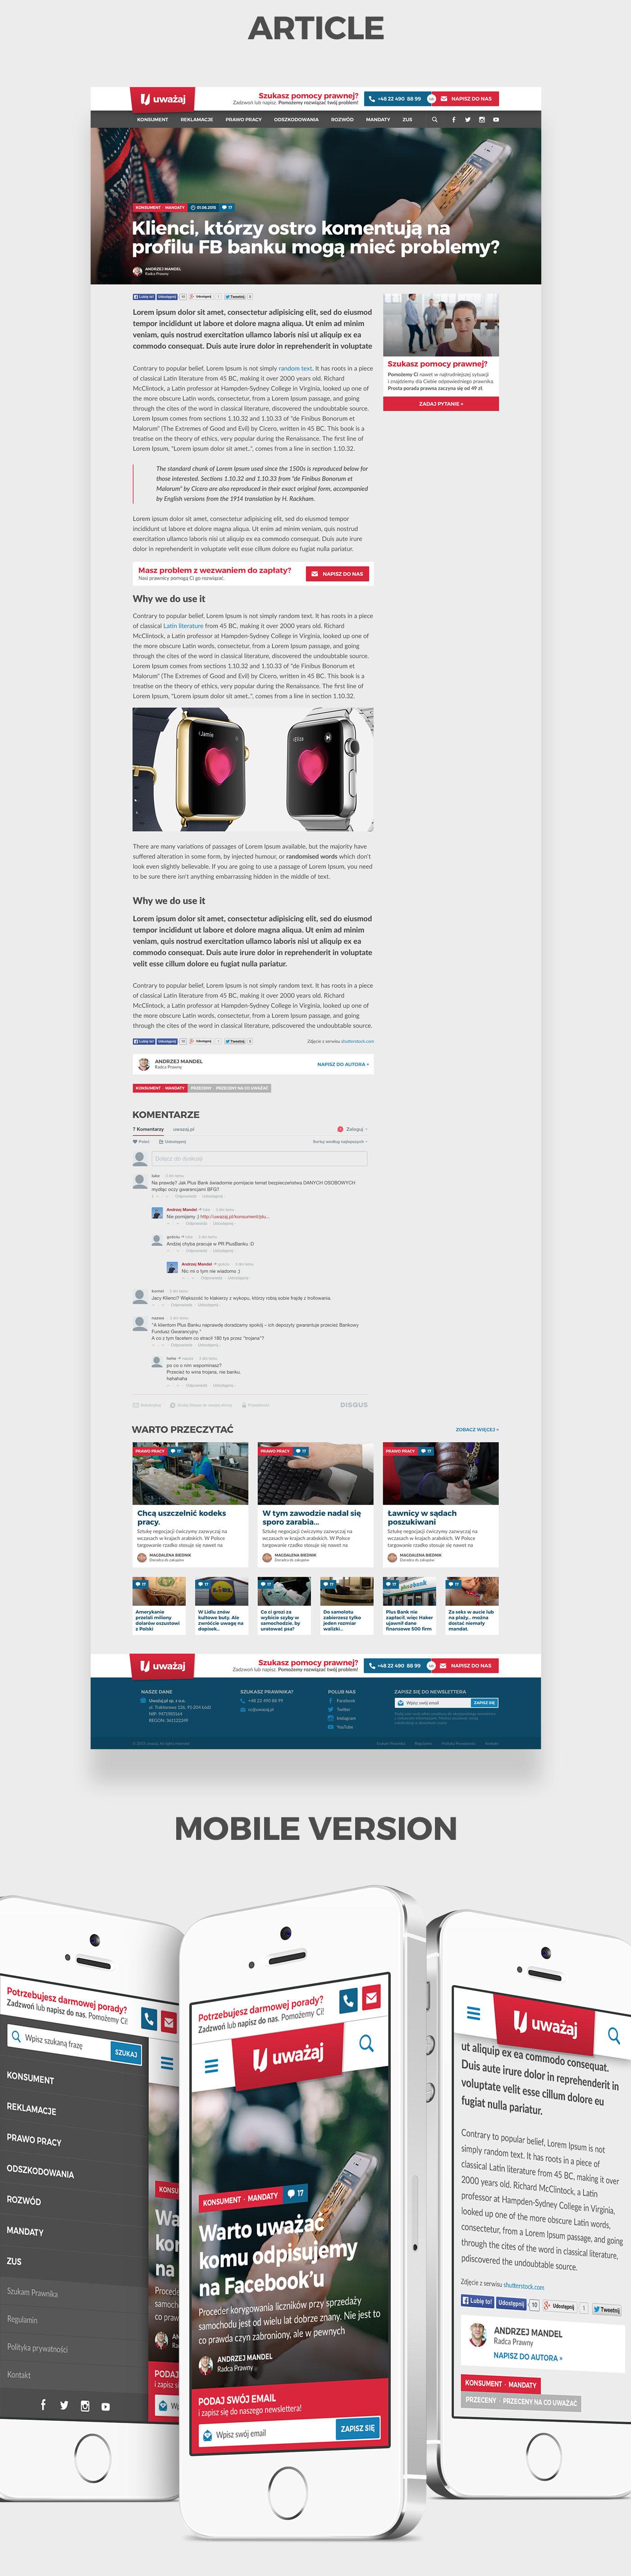 legal service wortal portal article lawyer help case flat Web Webdesign design